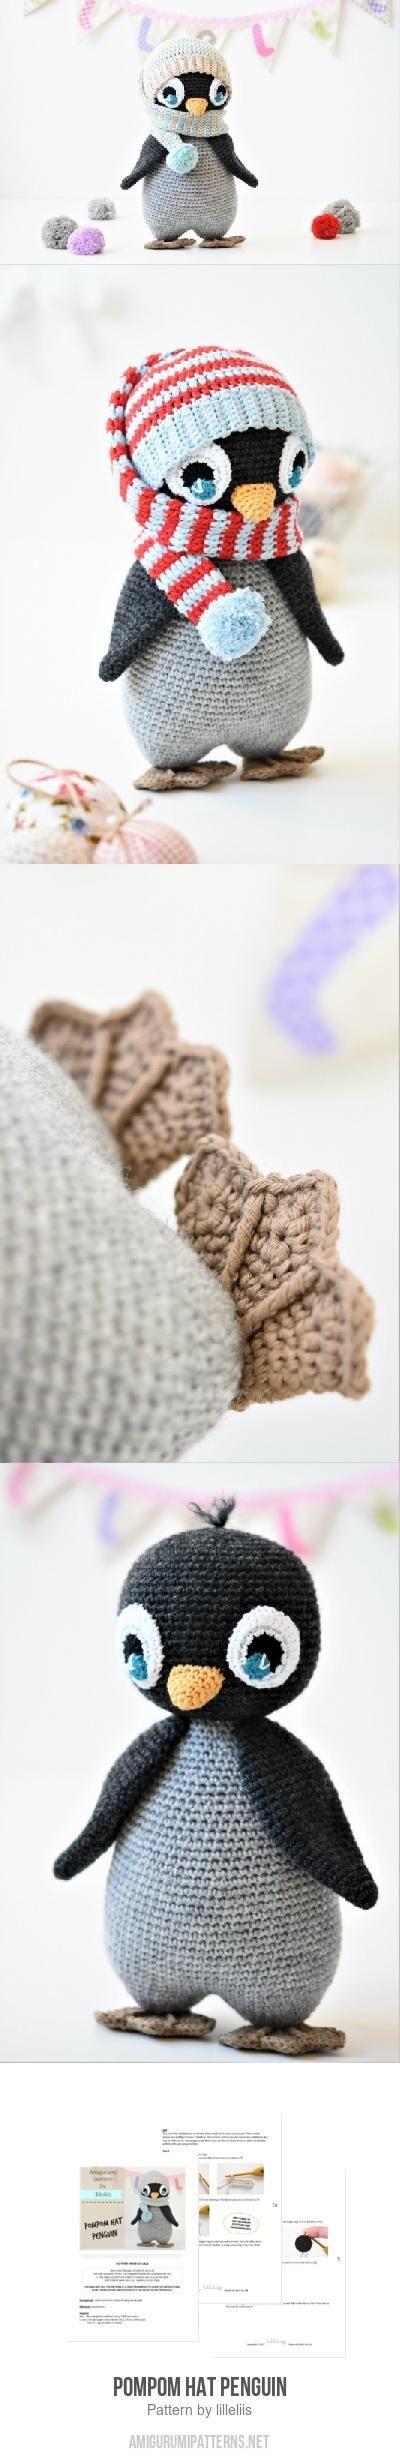 Pompom hat penguin amigurumi pattern | crochet | Pinterest ...